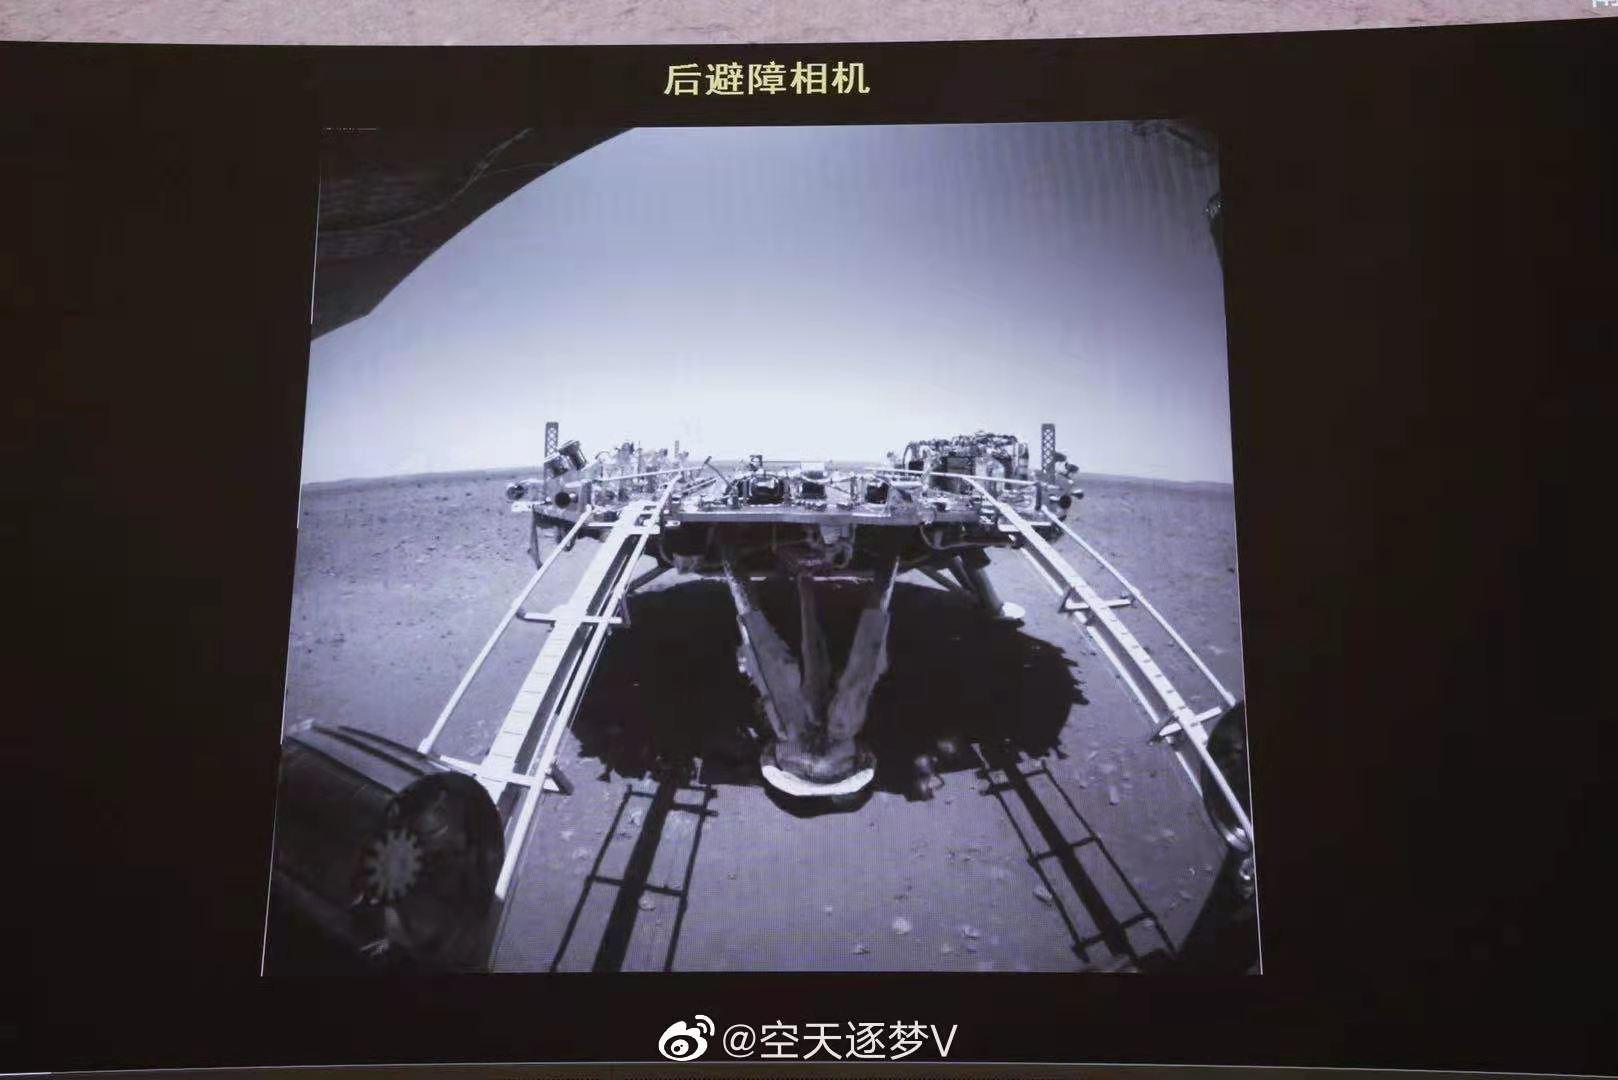 2021-zhurong-rolls-2.jpg